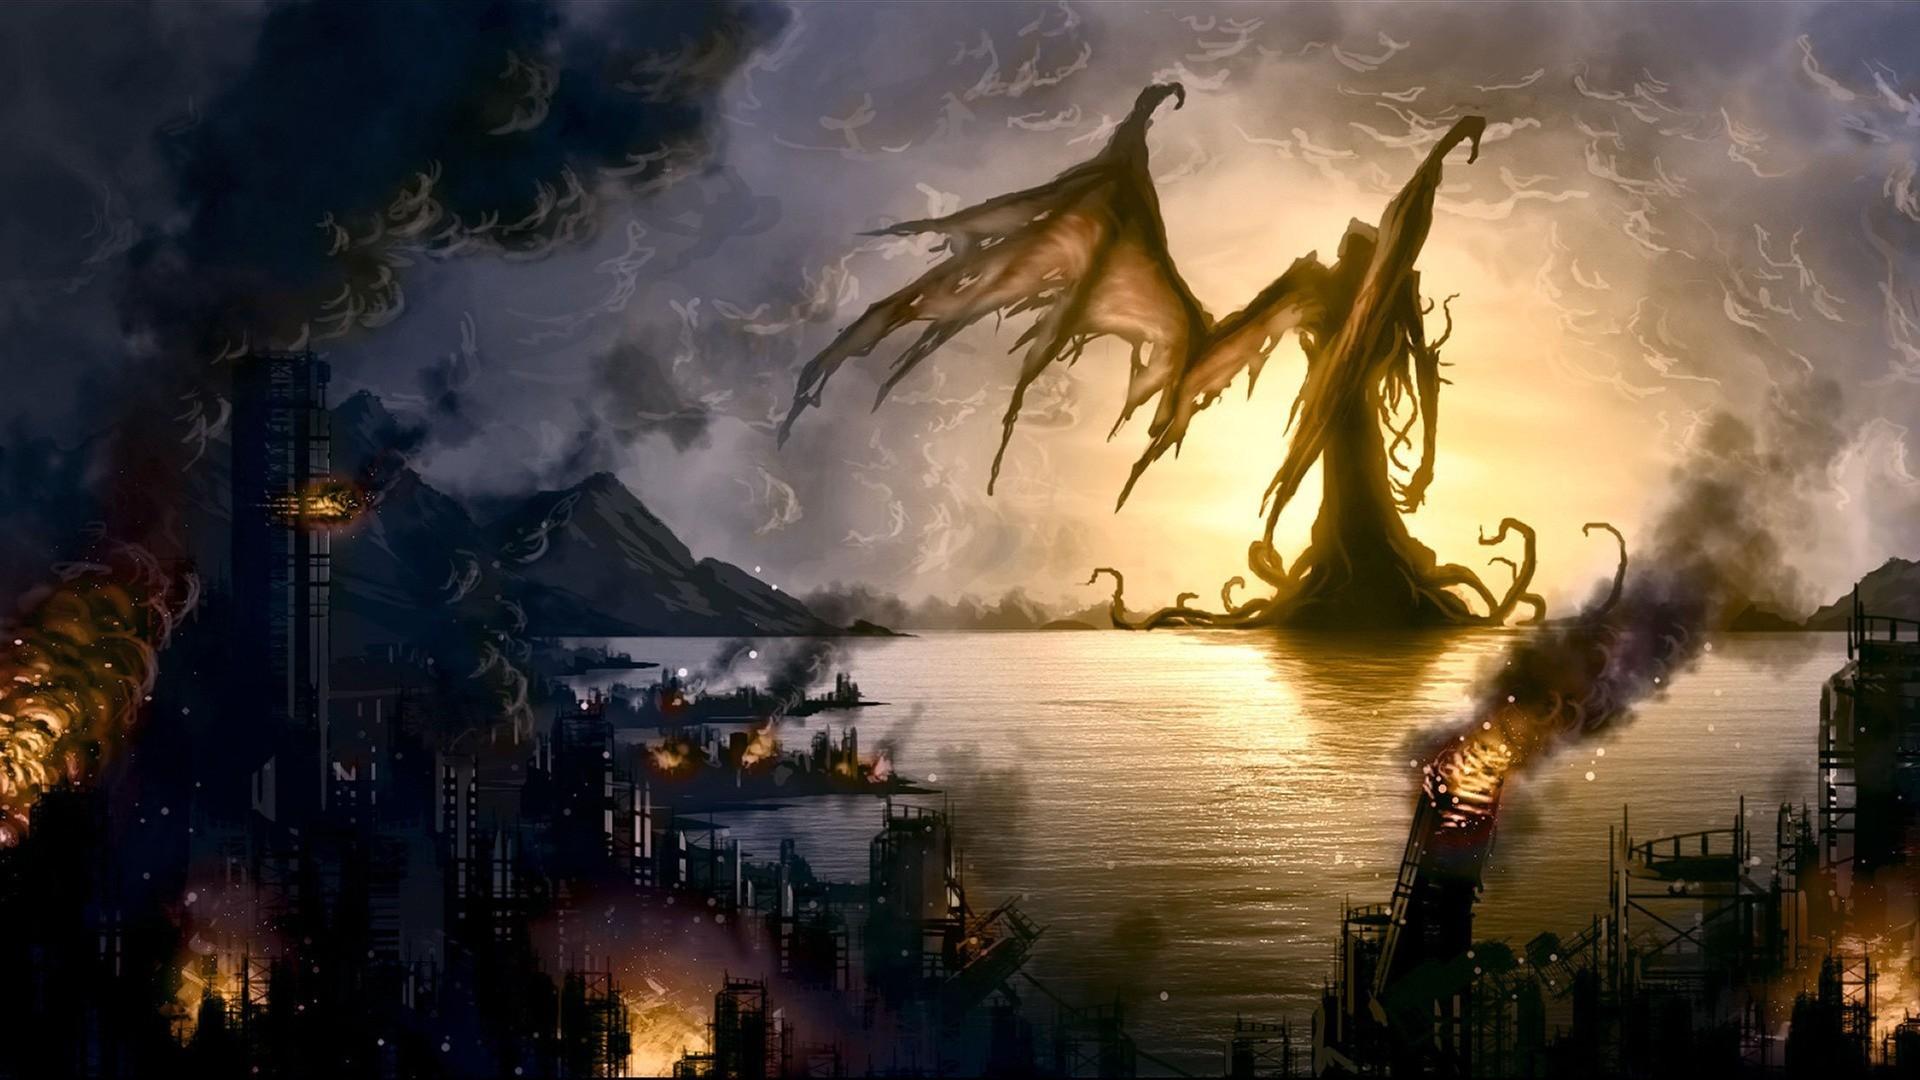 Fantasy_The_angel_of_death_has_destroyed_the_coastal_city_099530_.jpg